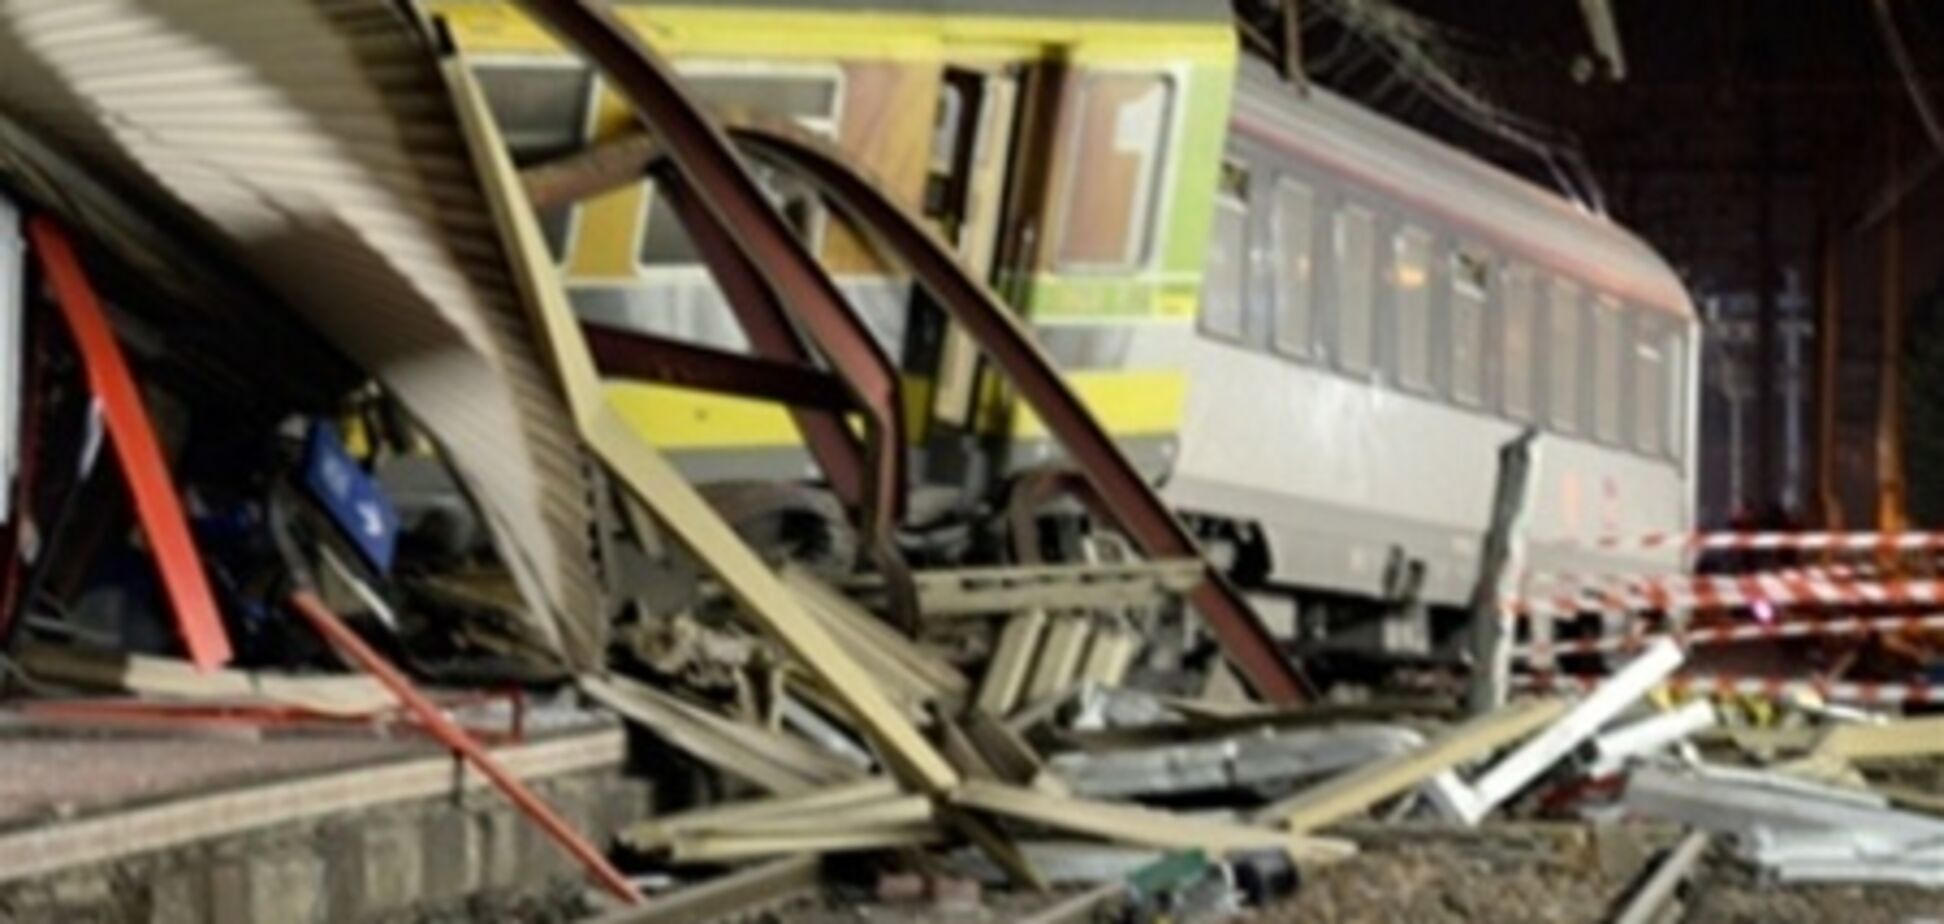 Установлена причина крушения поезда во Франции